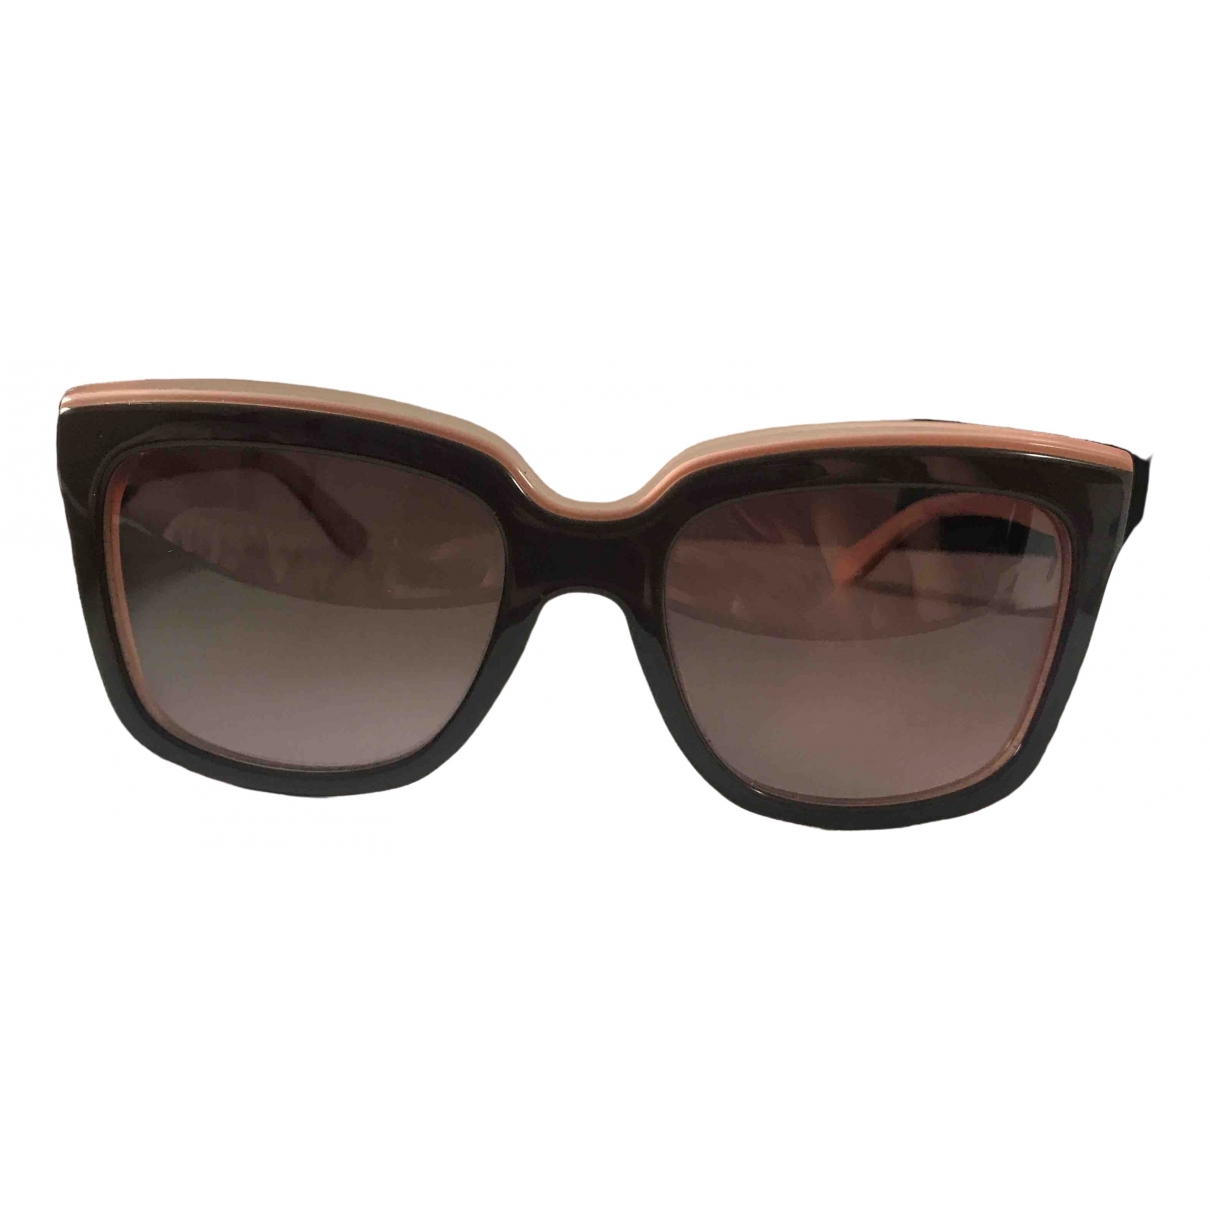 Salvatore Ferragamo \N Brown Sunglasses for Women \N